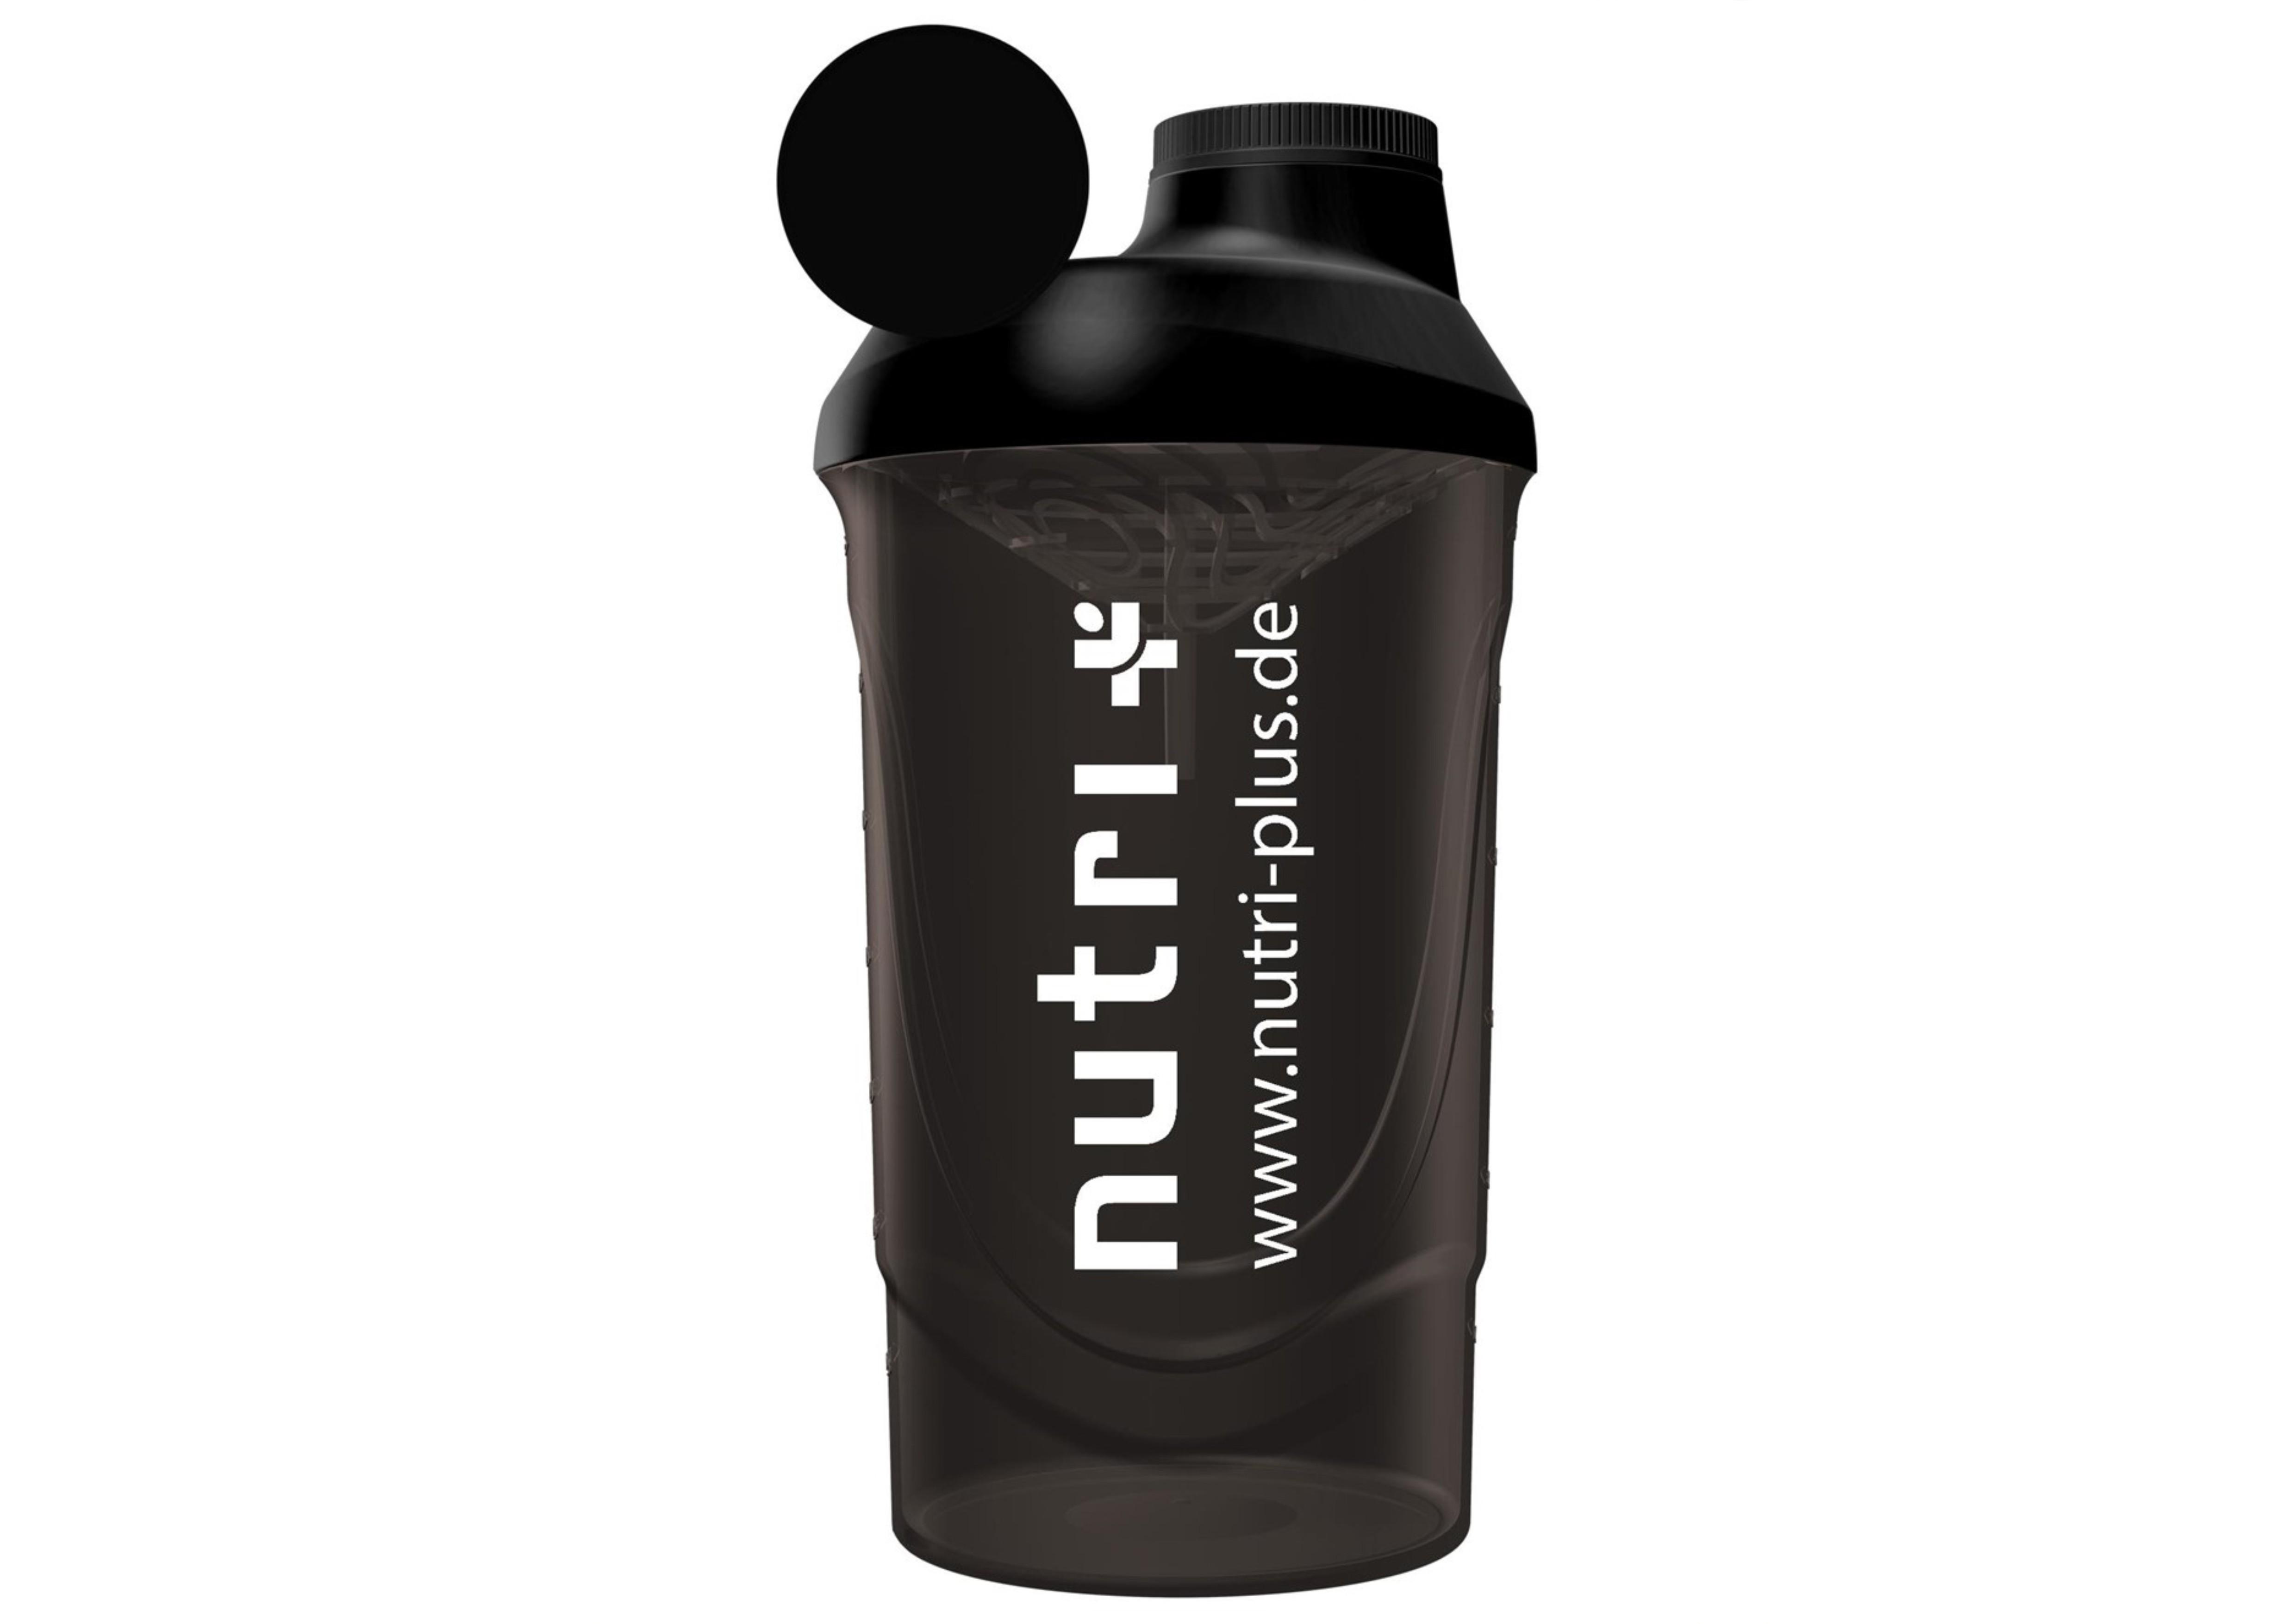 nutri+ Eiweiß + Fitness Shaker (black-smoked)